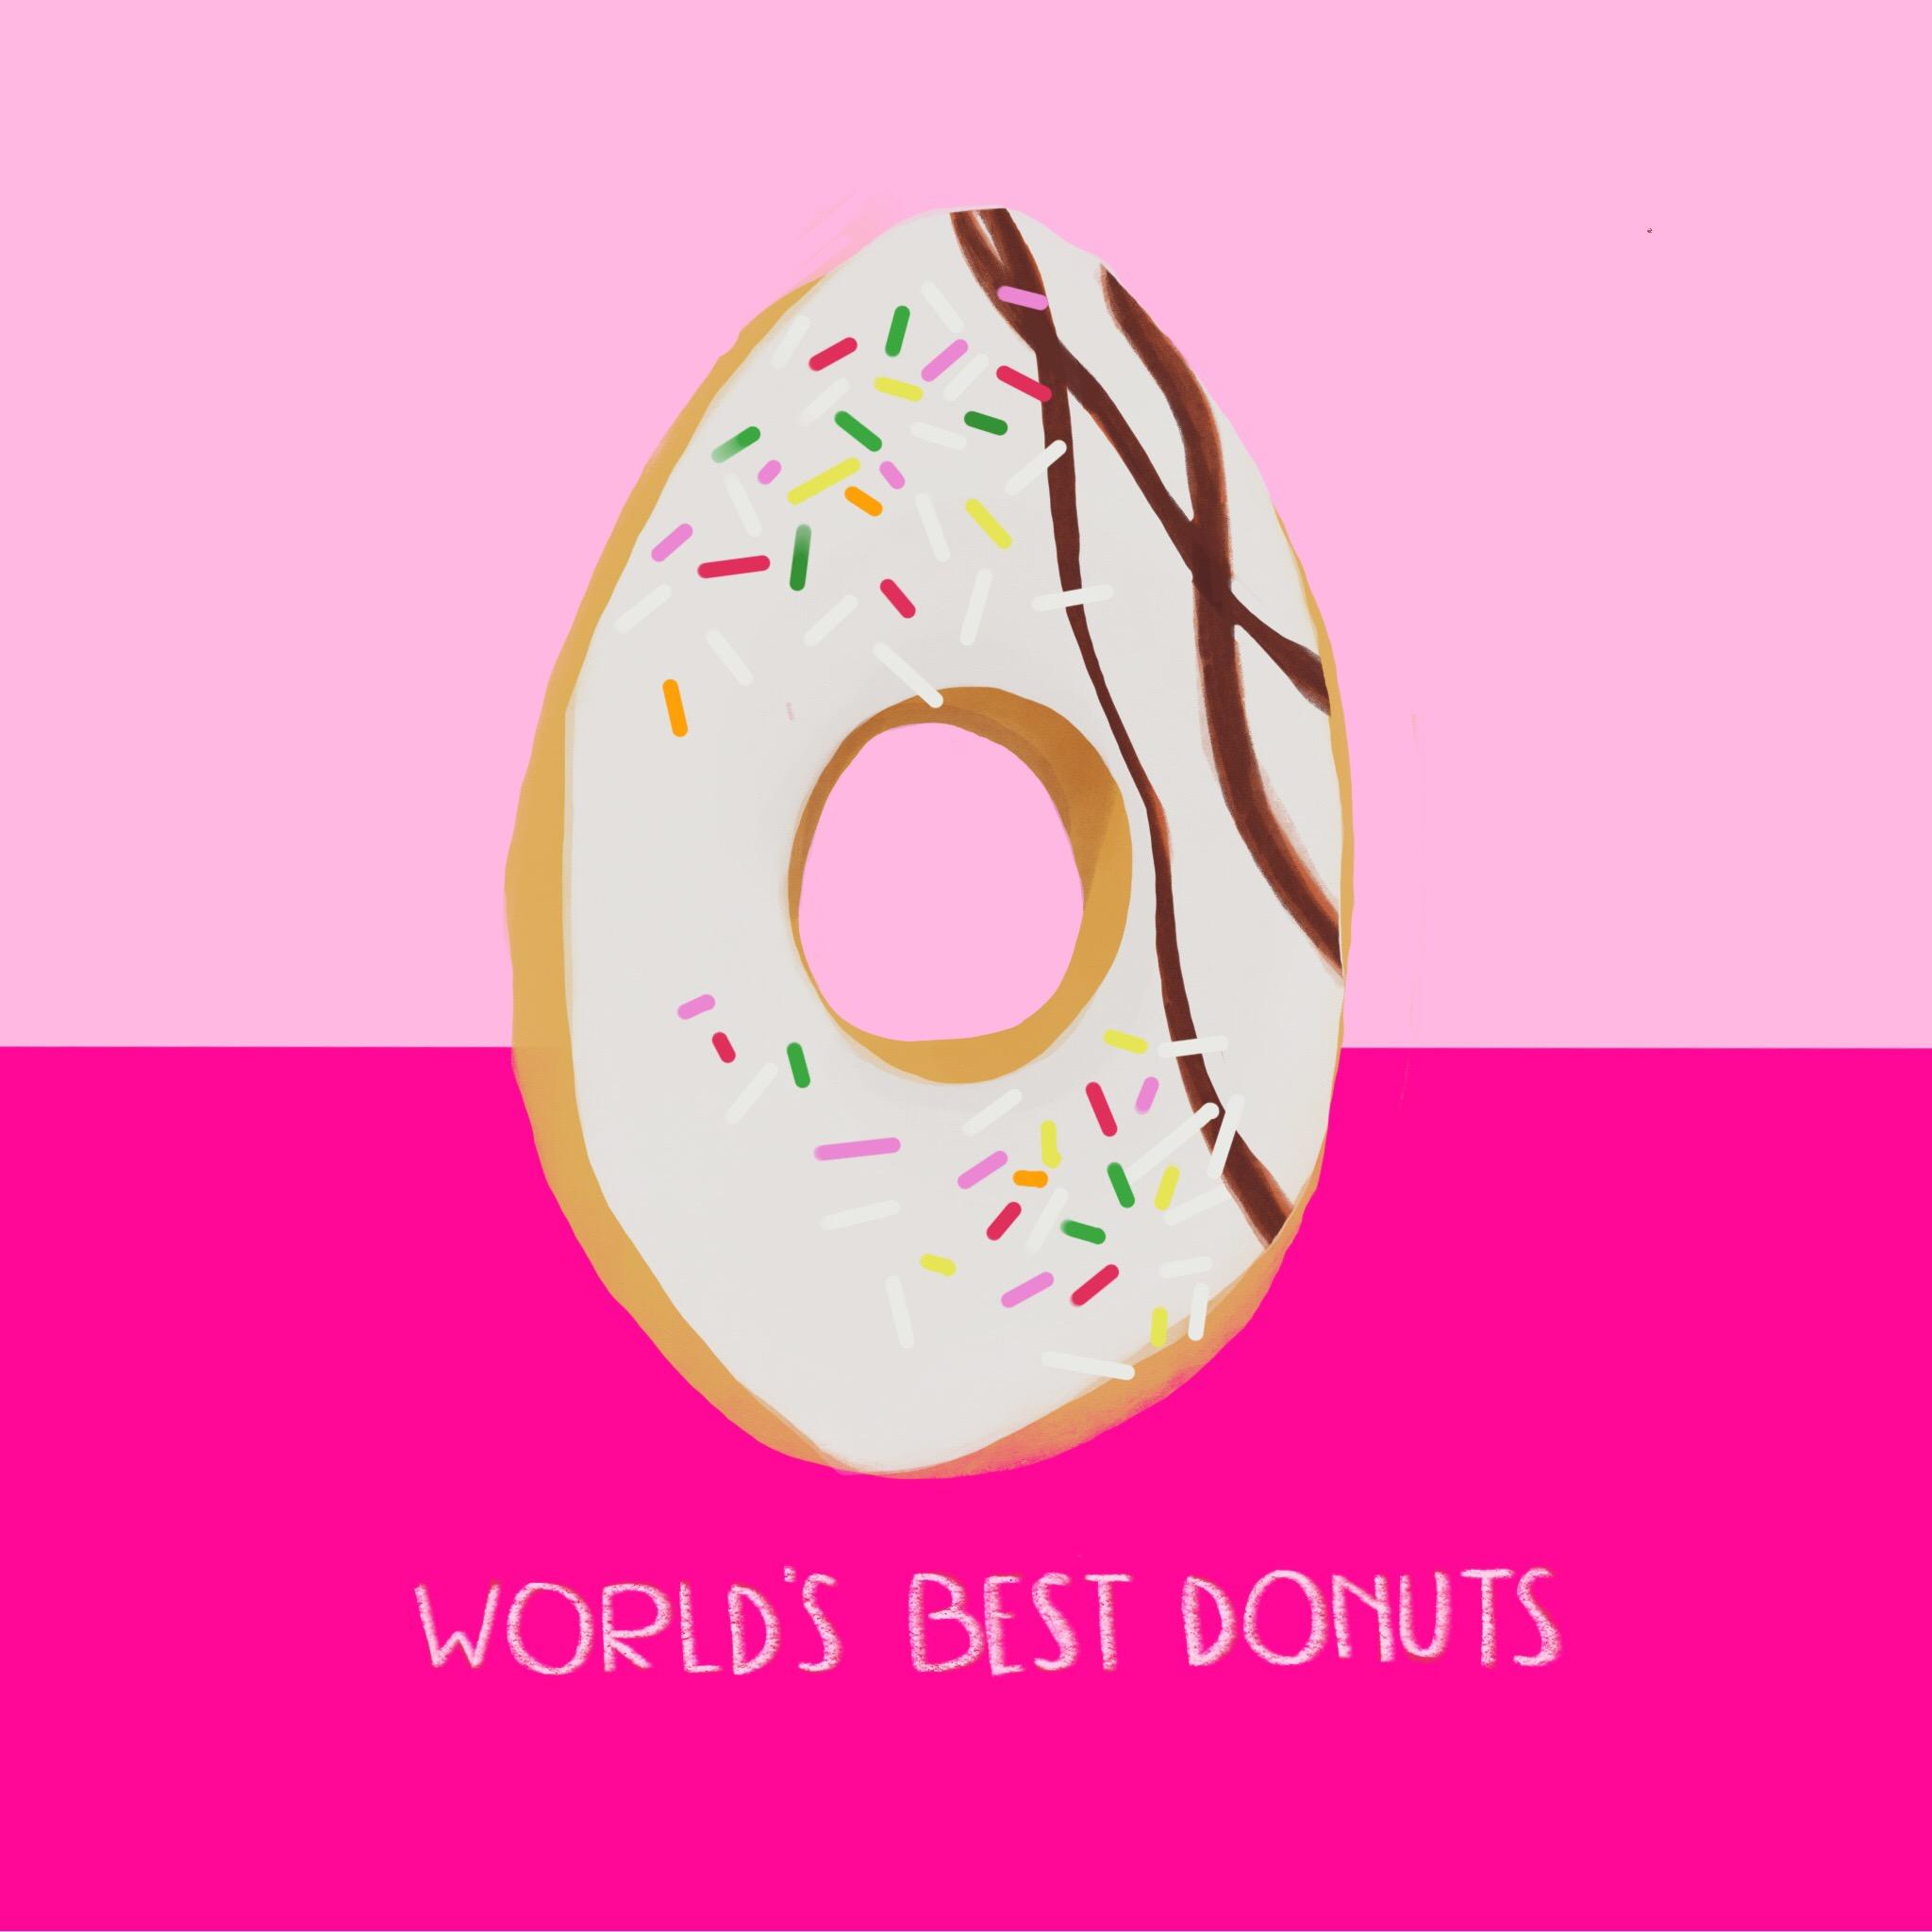 15_-_World's_Best_Donuts.jpg